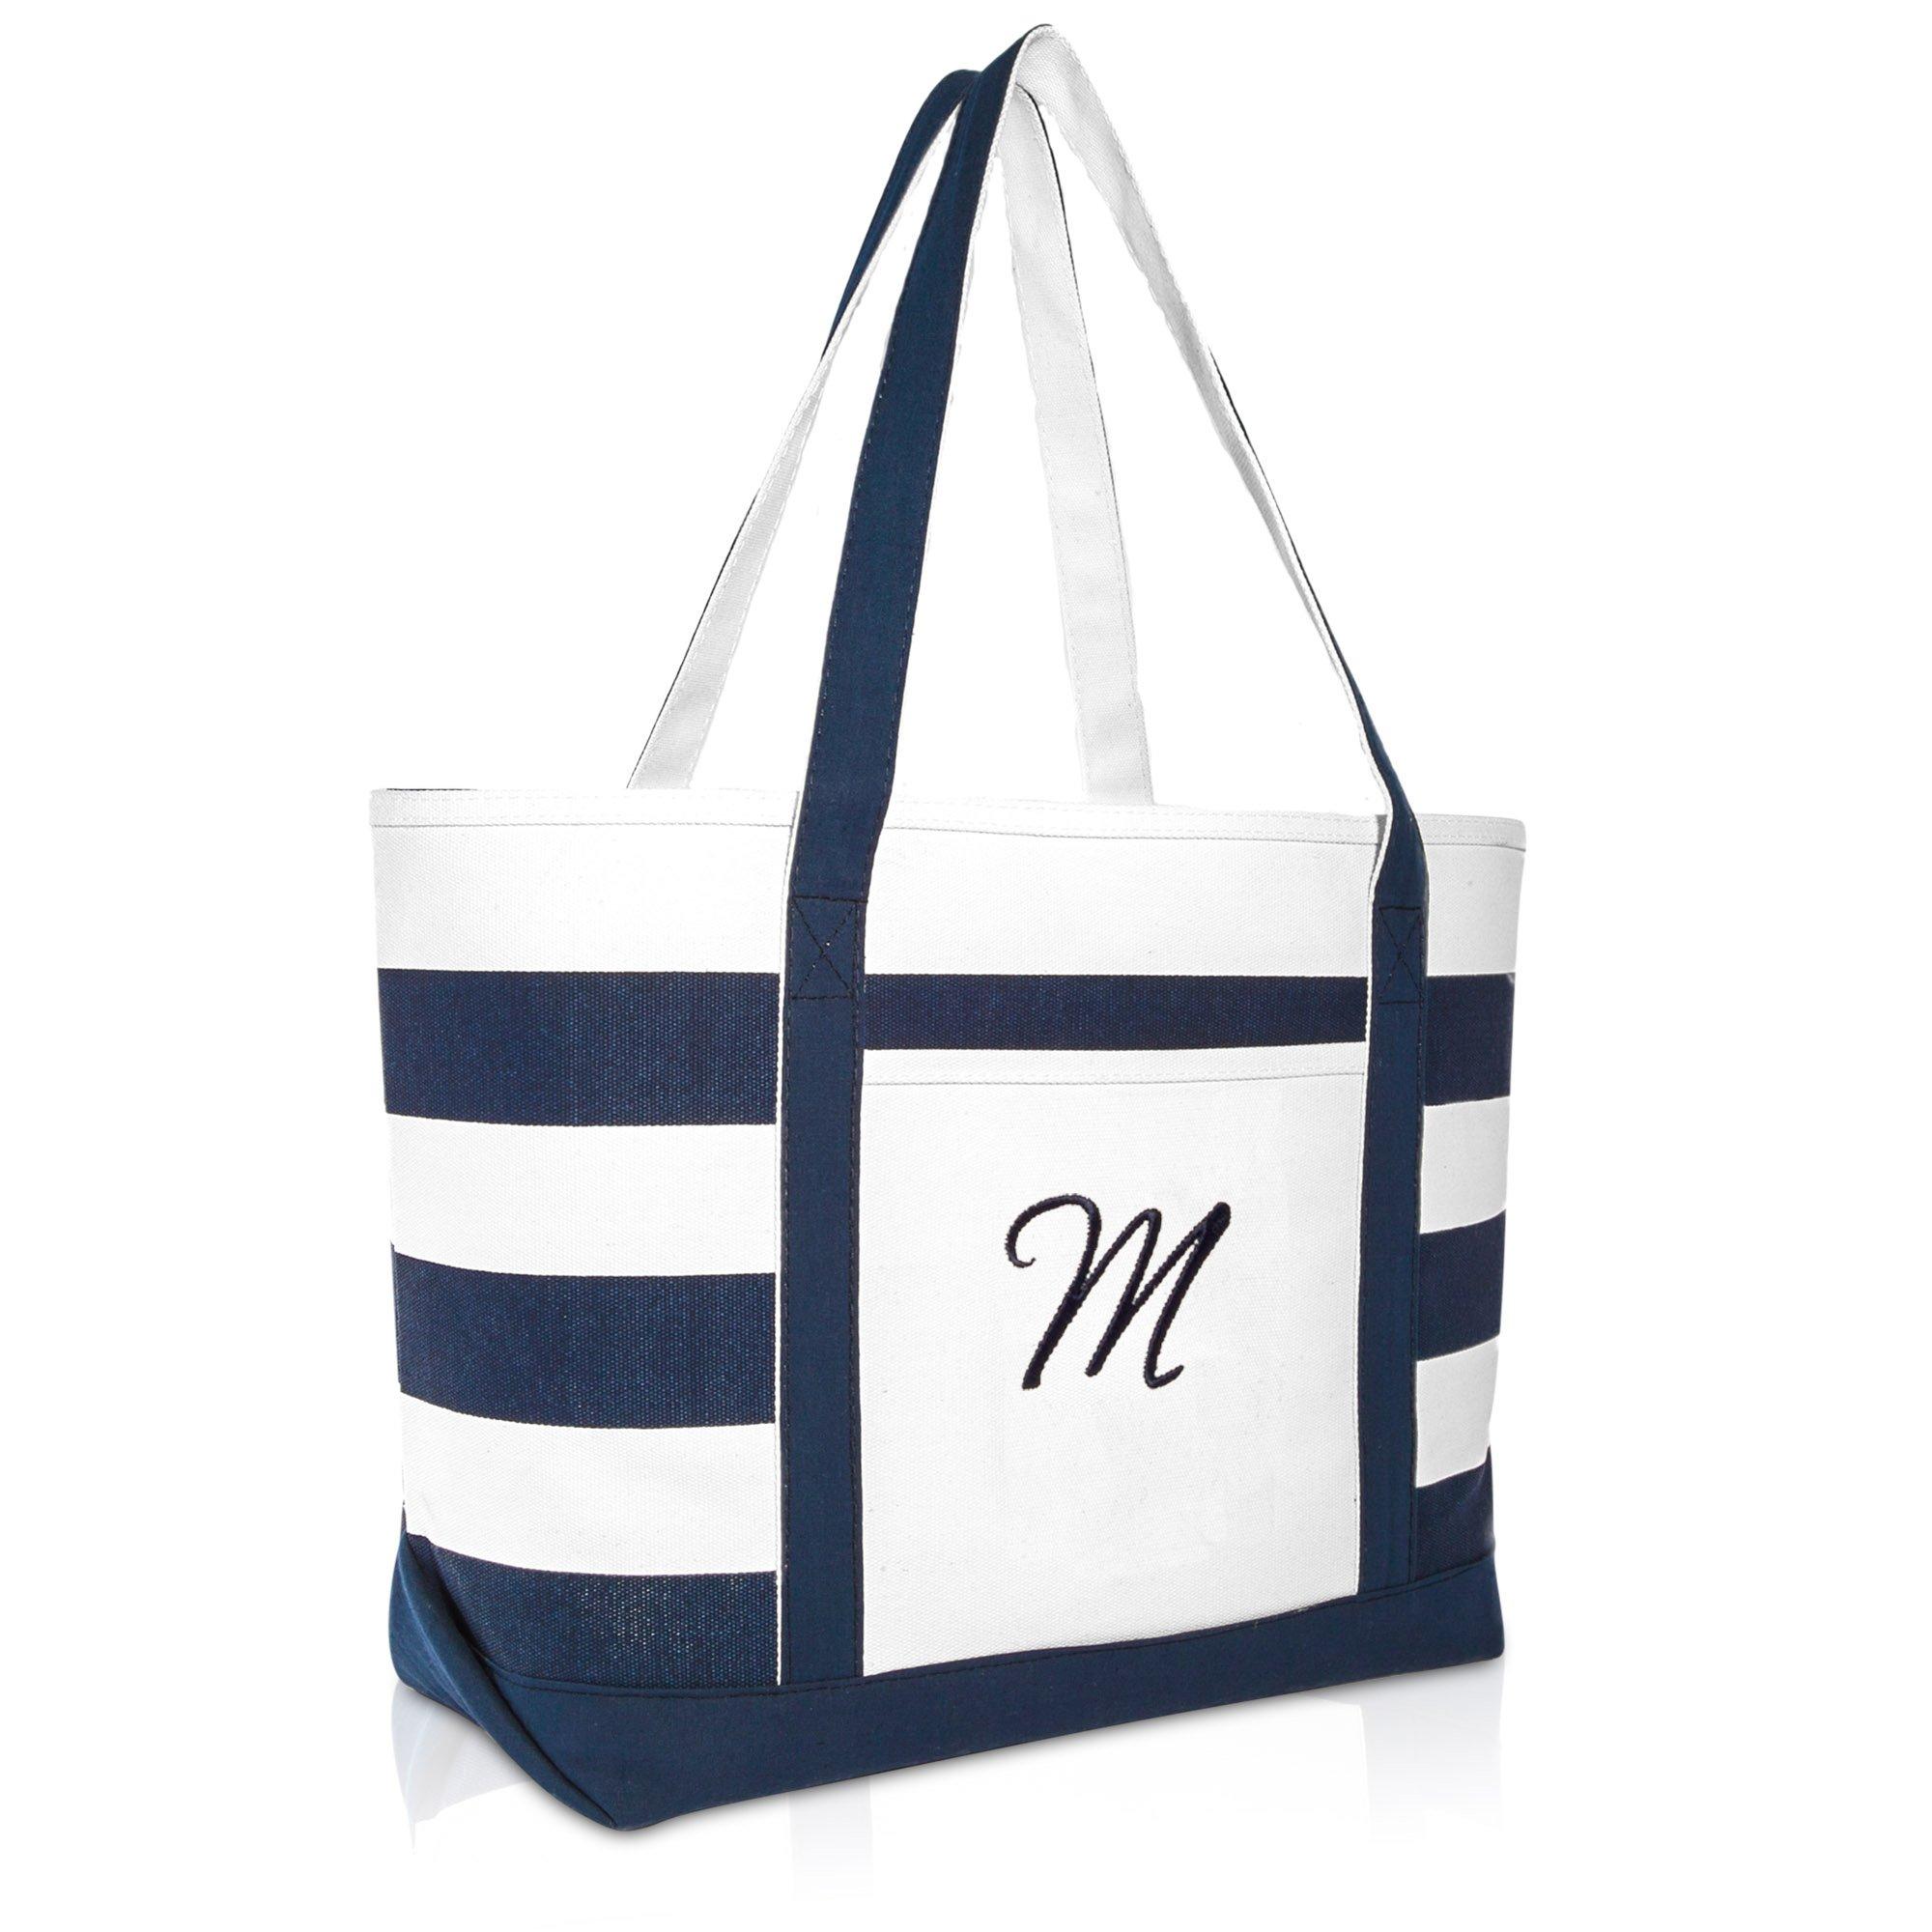 DALIX Premium Beach Bags Striped Navy Blue Zippered Tote Bag Monogrammed M